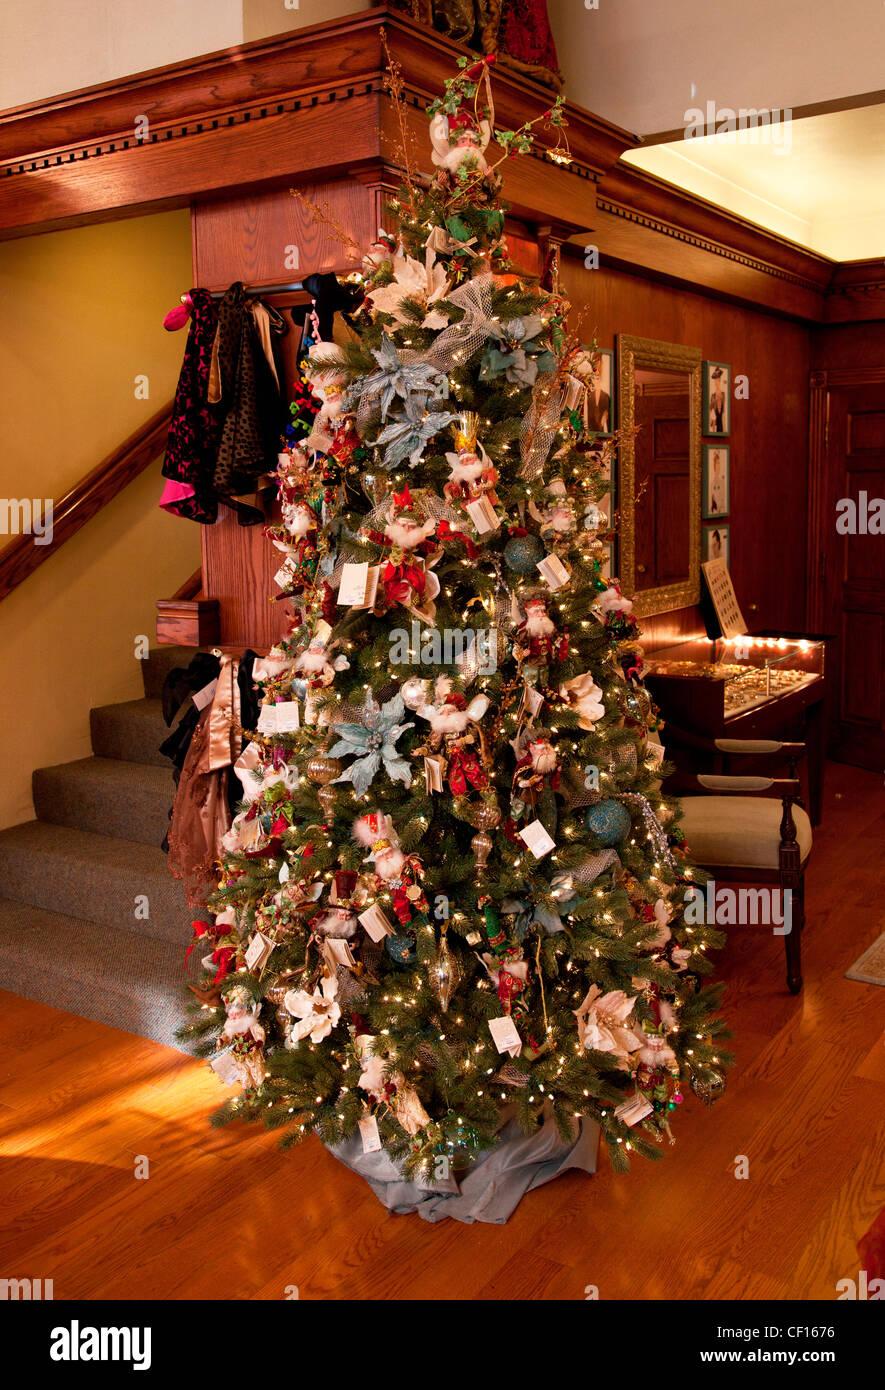 DECORATED CHRISTMAS TREE,USA - Stock Image